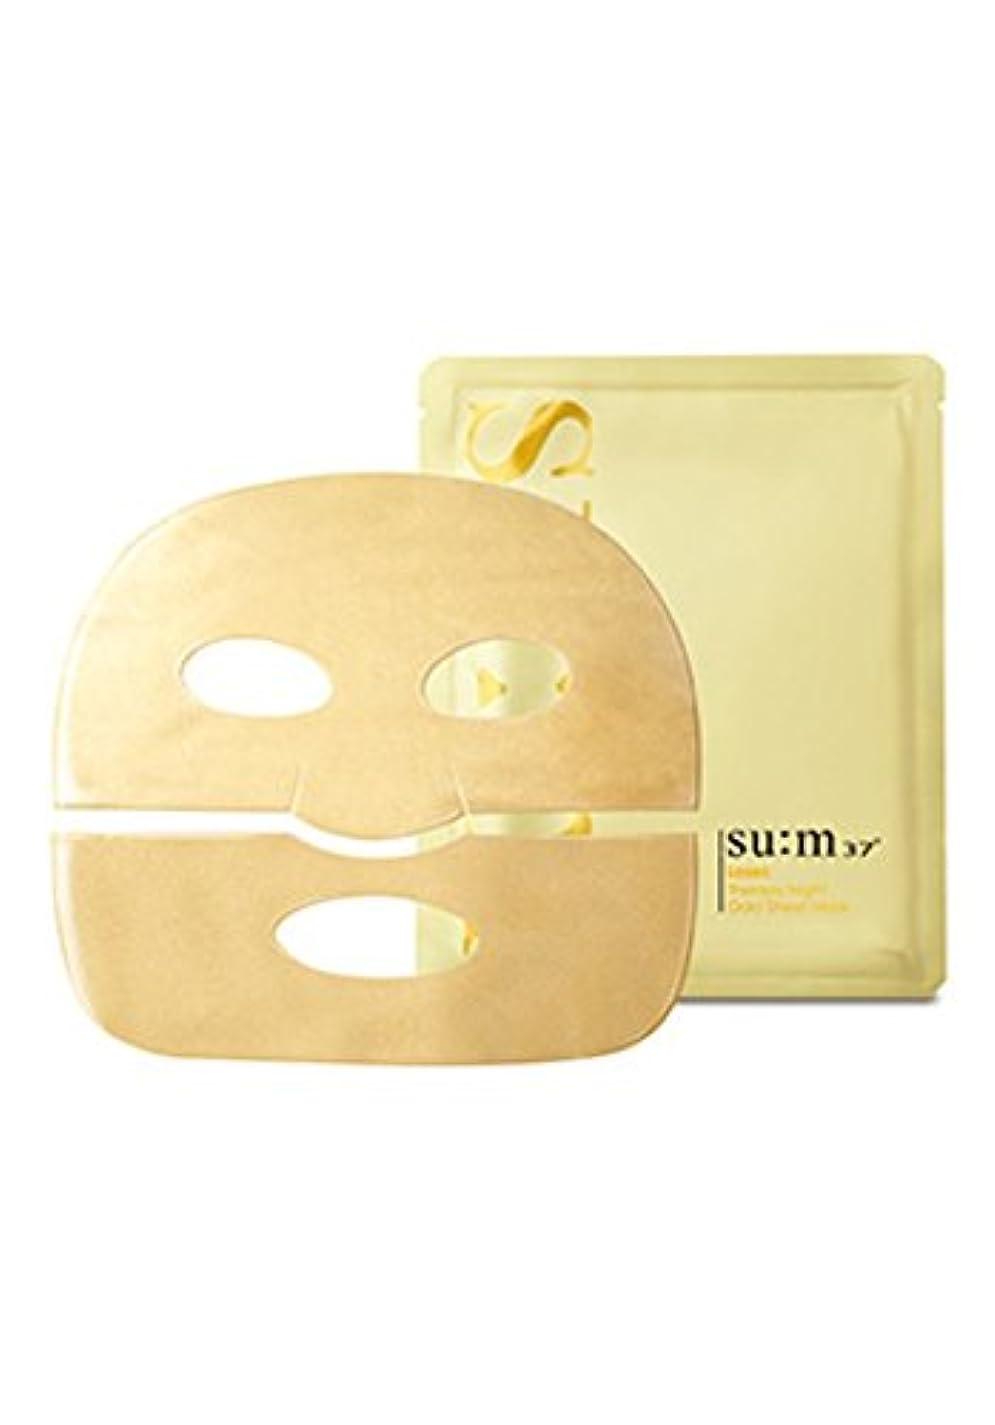 su:m37° Losec Therapy Night Gold Sheet Mask 7Sheets/スム37° ロセック セラピー ナイト ゴールド シートマスク 7枚